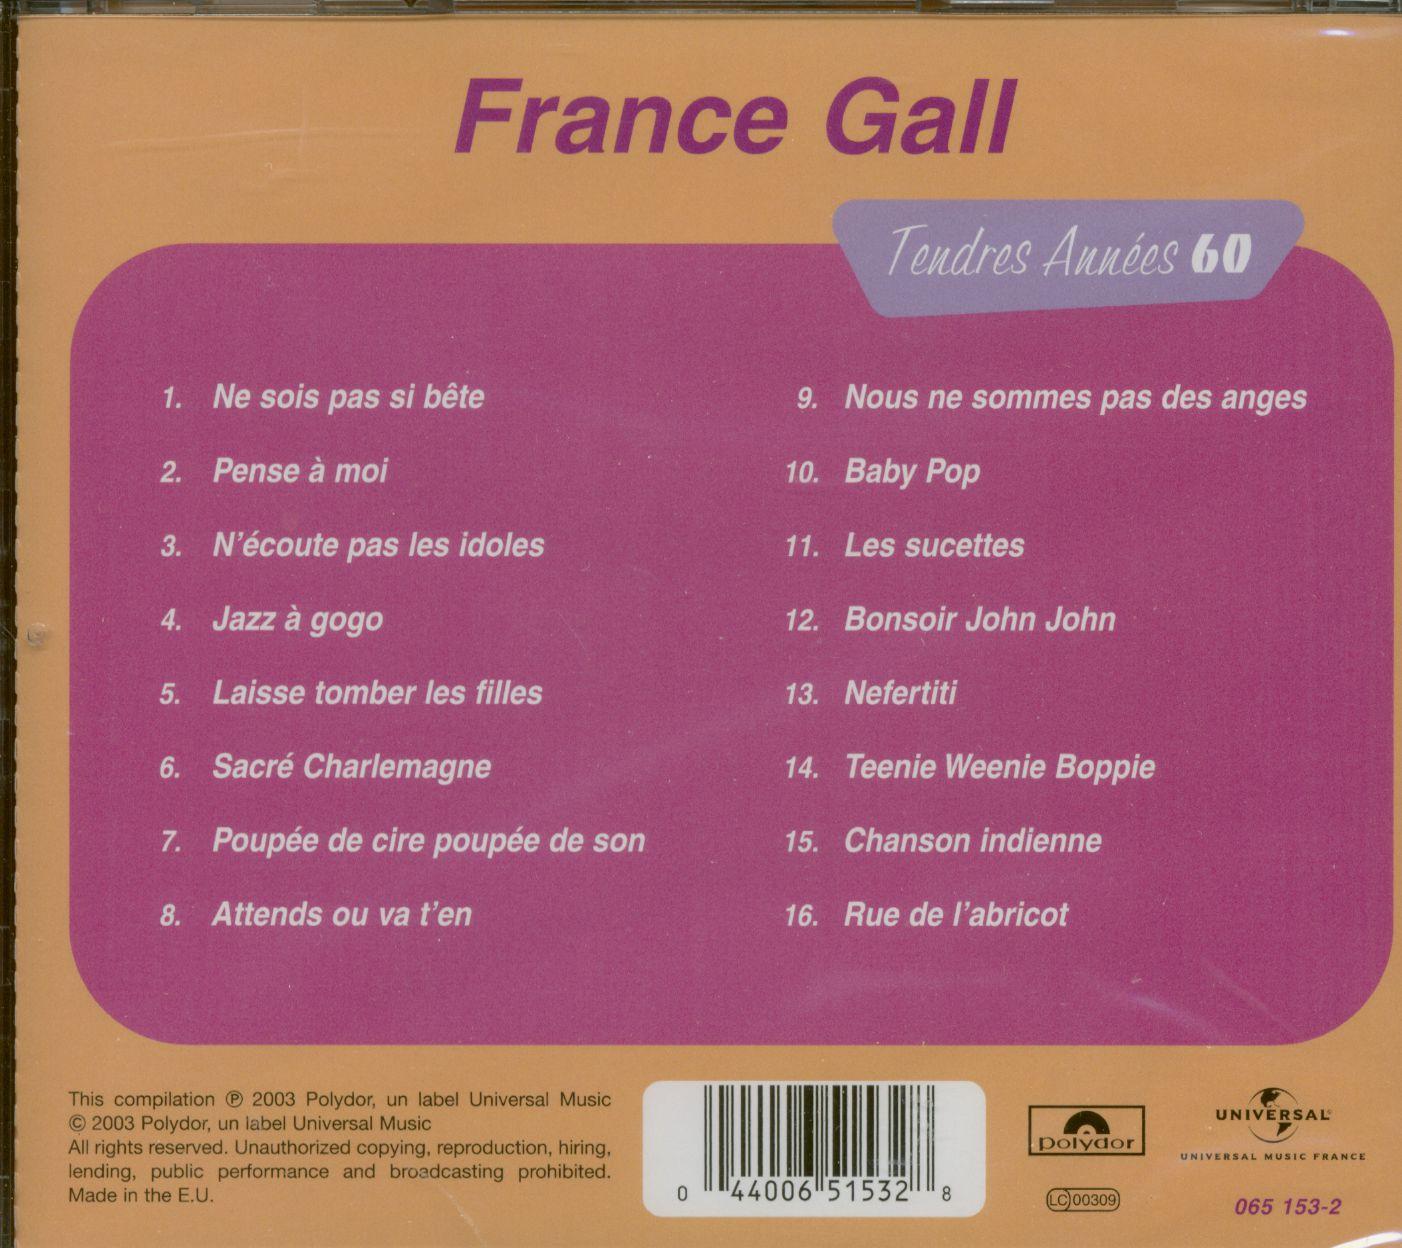 France Gall Cd: Tendres Annees 60 (Cd) - Bear Family Records intérieur Chanson Pense À Moi